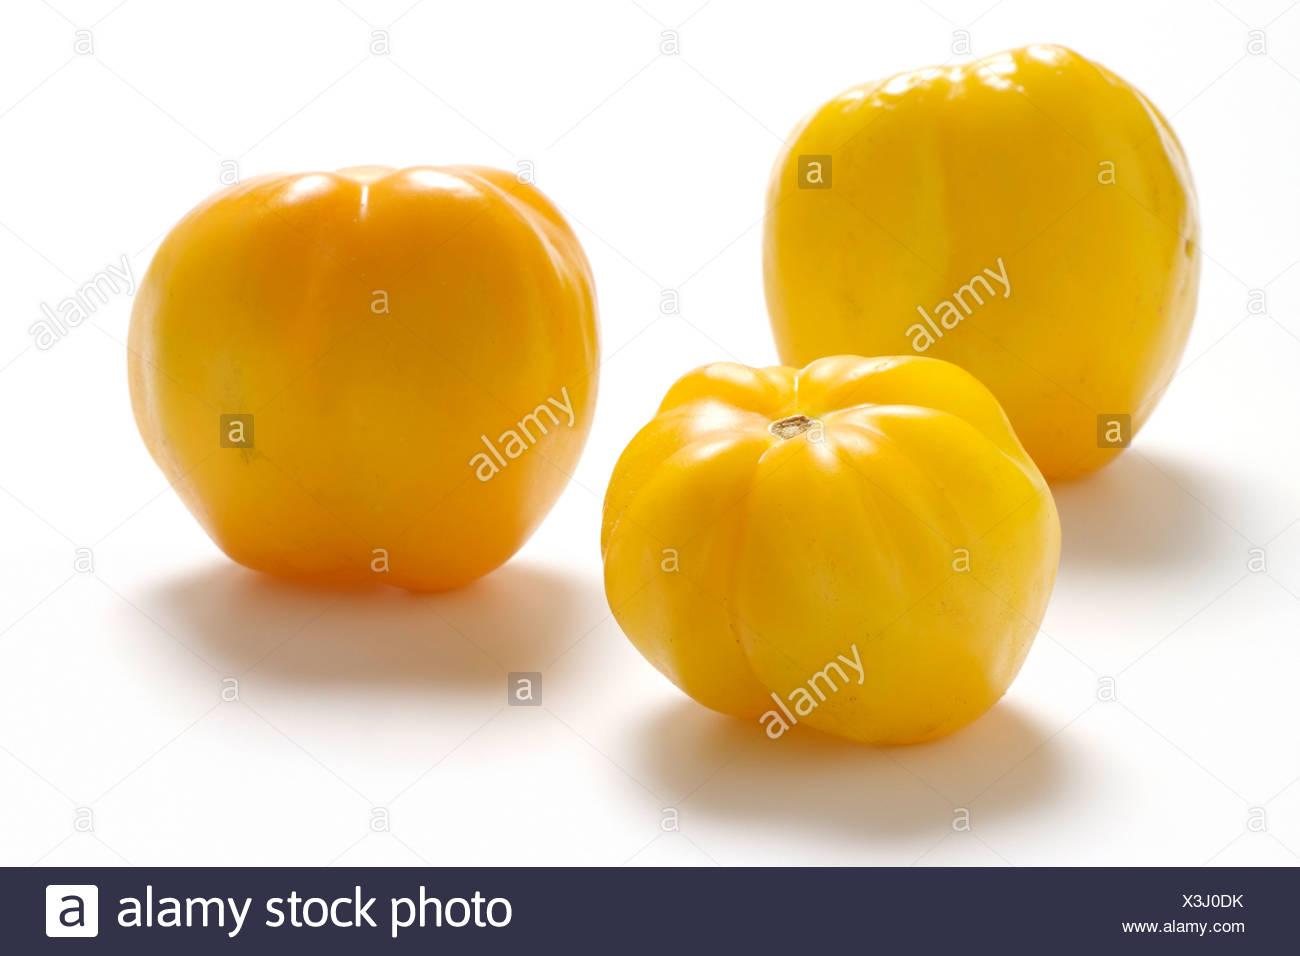 Tomato varieties: Yellow Stuffer - Stock Image